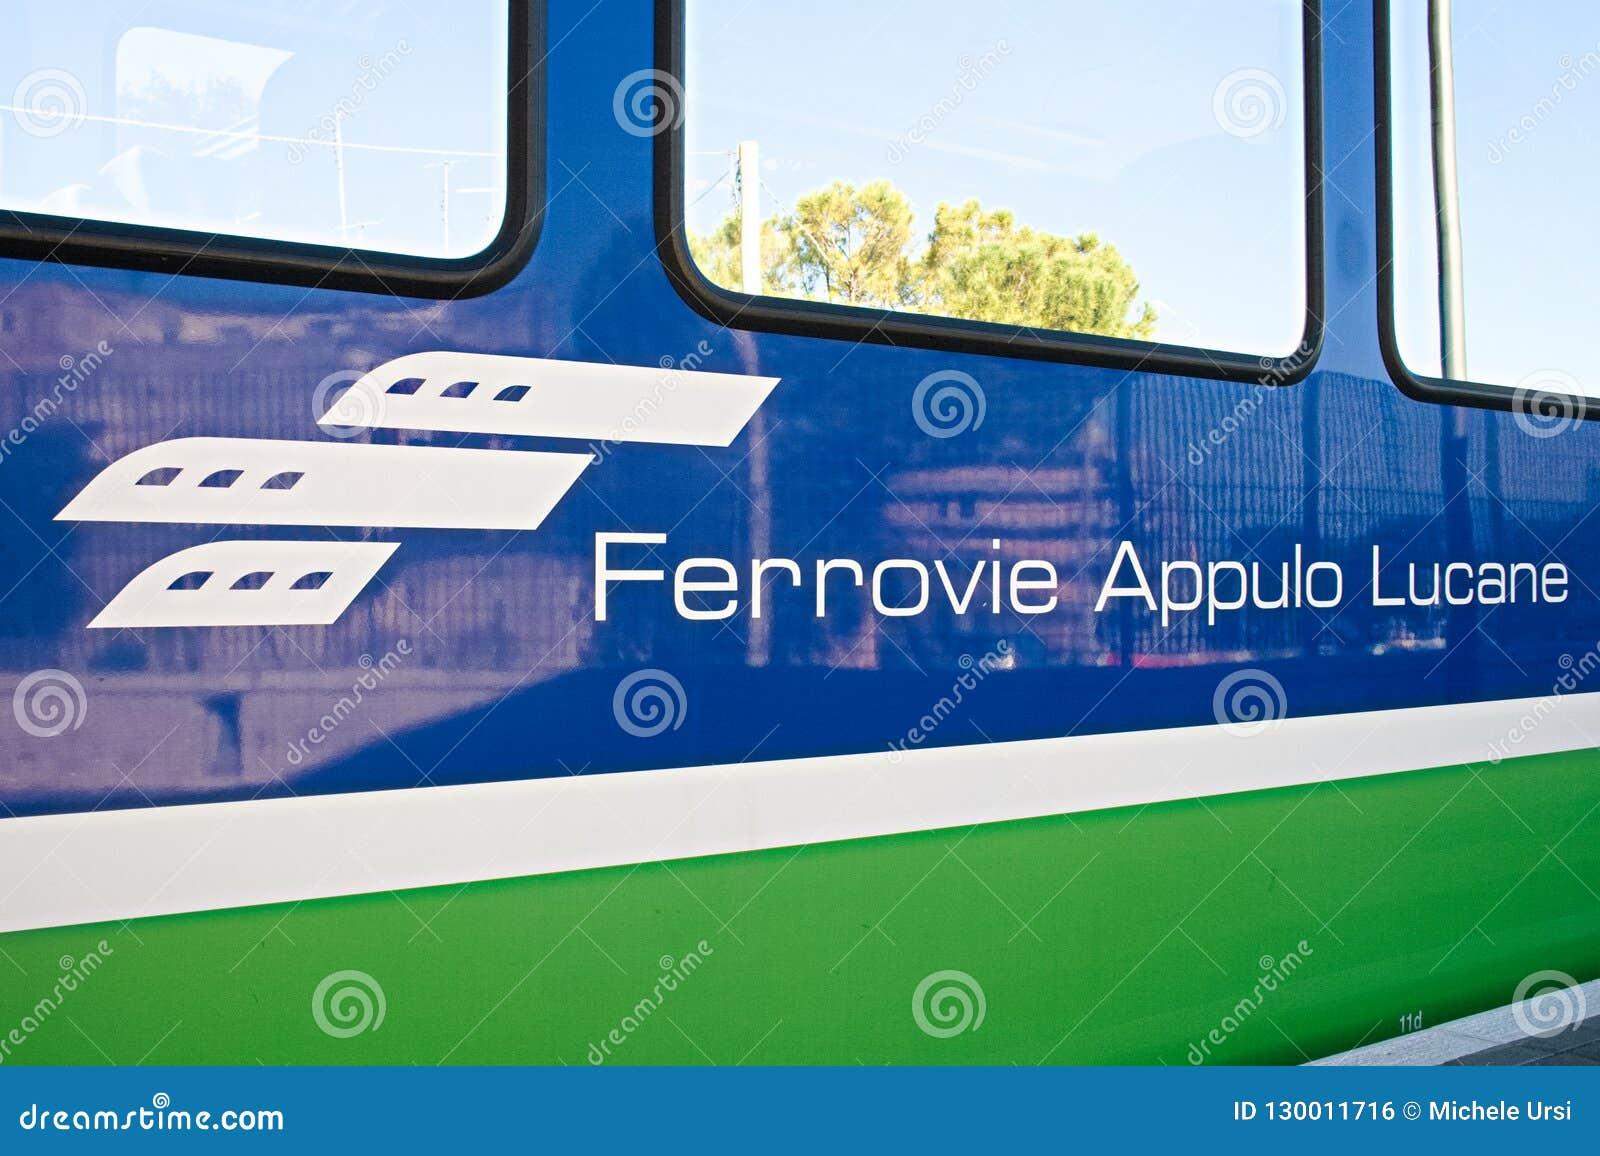 FAL, Ferrovie Appulo Lucane, réseau ferroviaire italien, trains reliant Bari, Puglia vers Matera, Basilicate